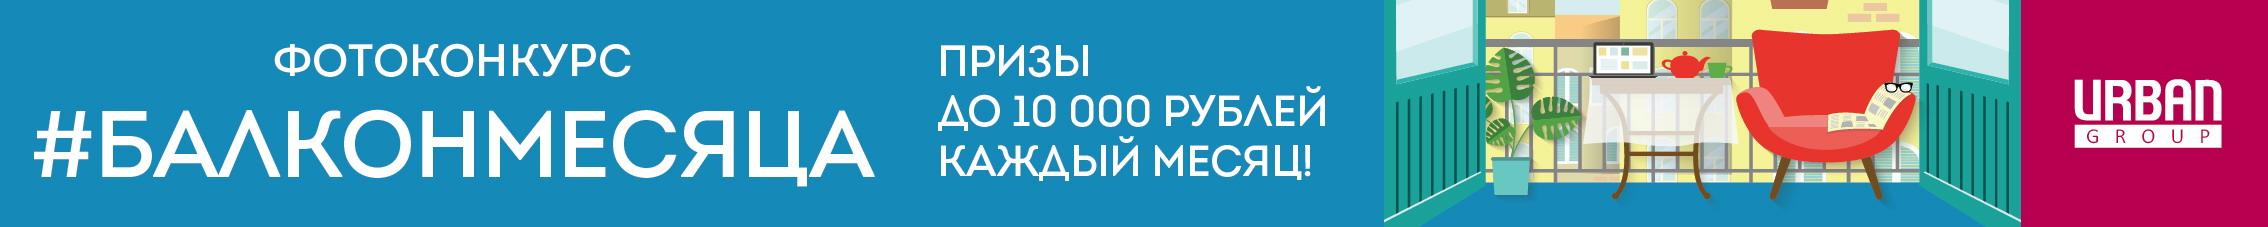 Фотоконкурс Банкон месяца. Призы до 10000 рублей!